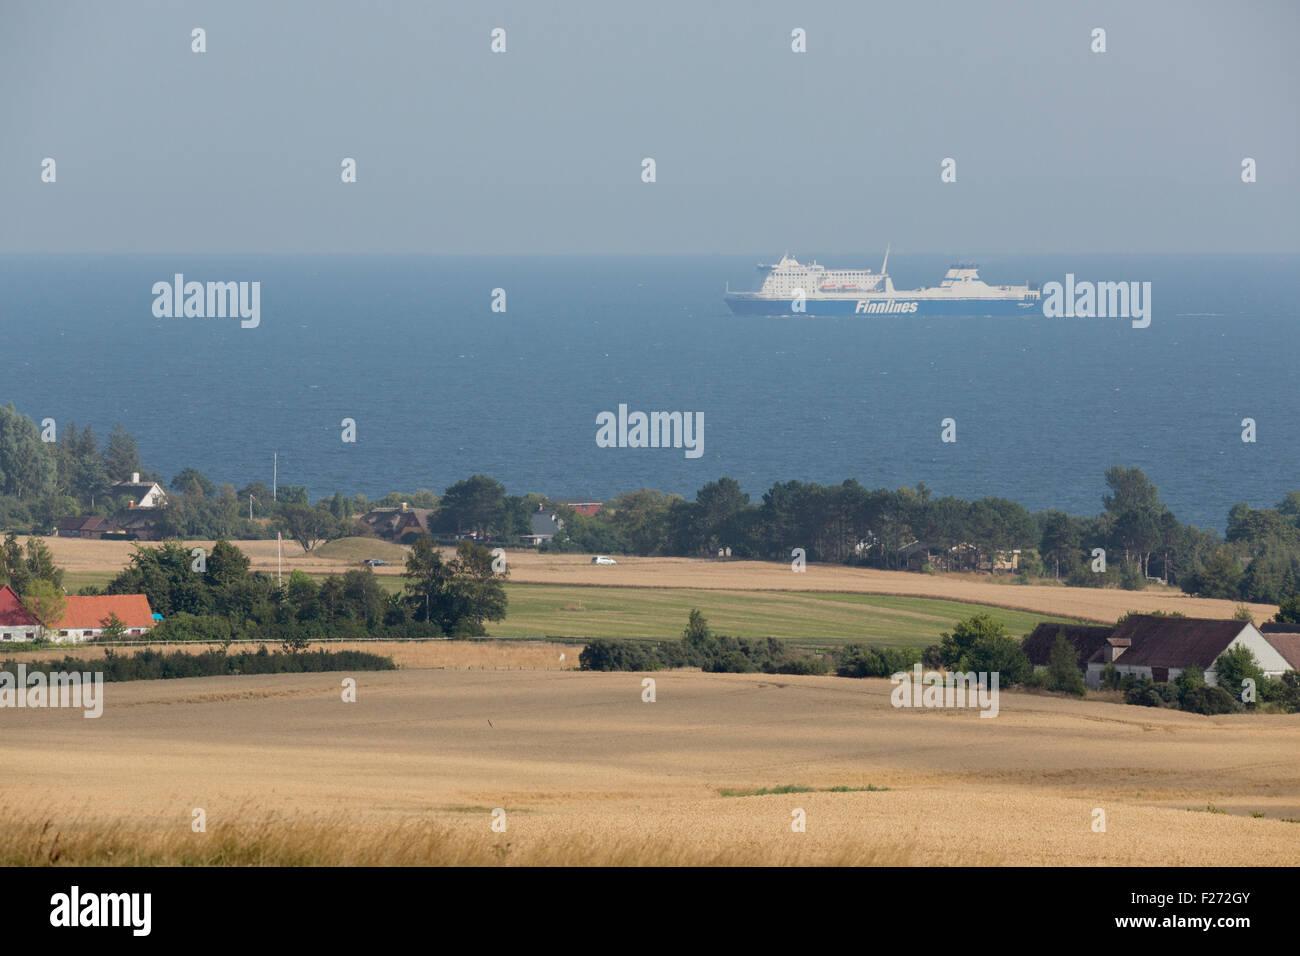 A Finnlines Star Class vessel seen from the hills of Møn, Denmark - Stock Image